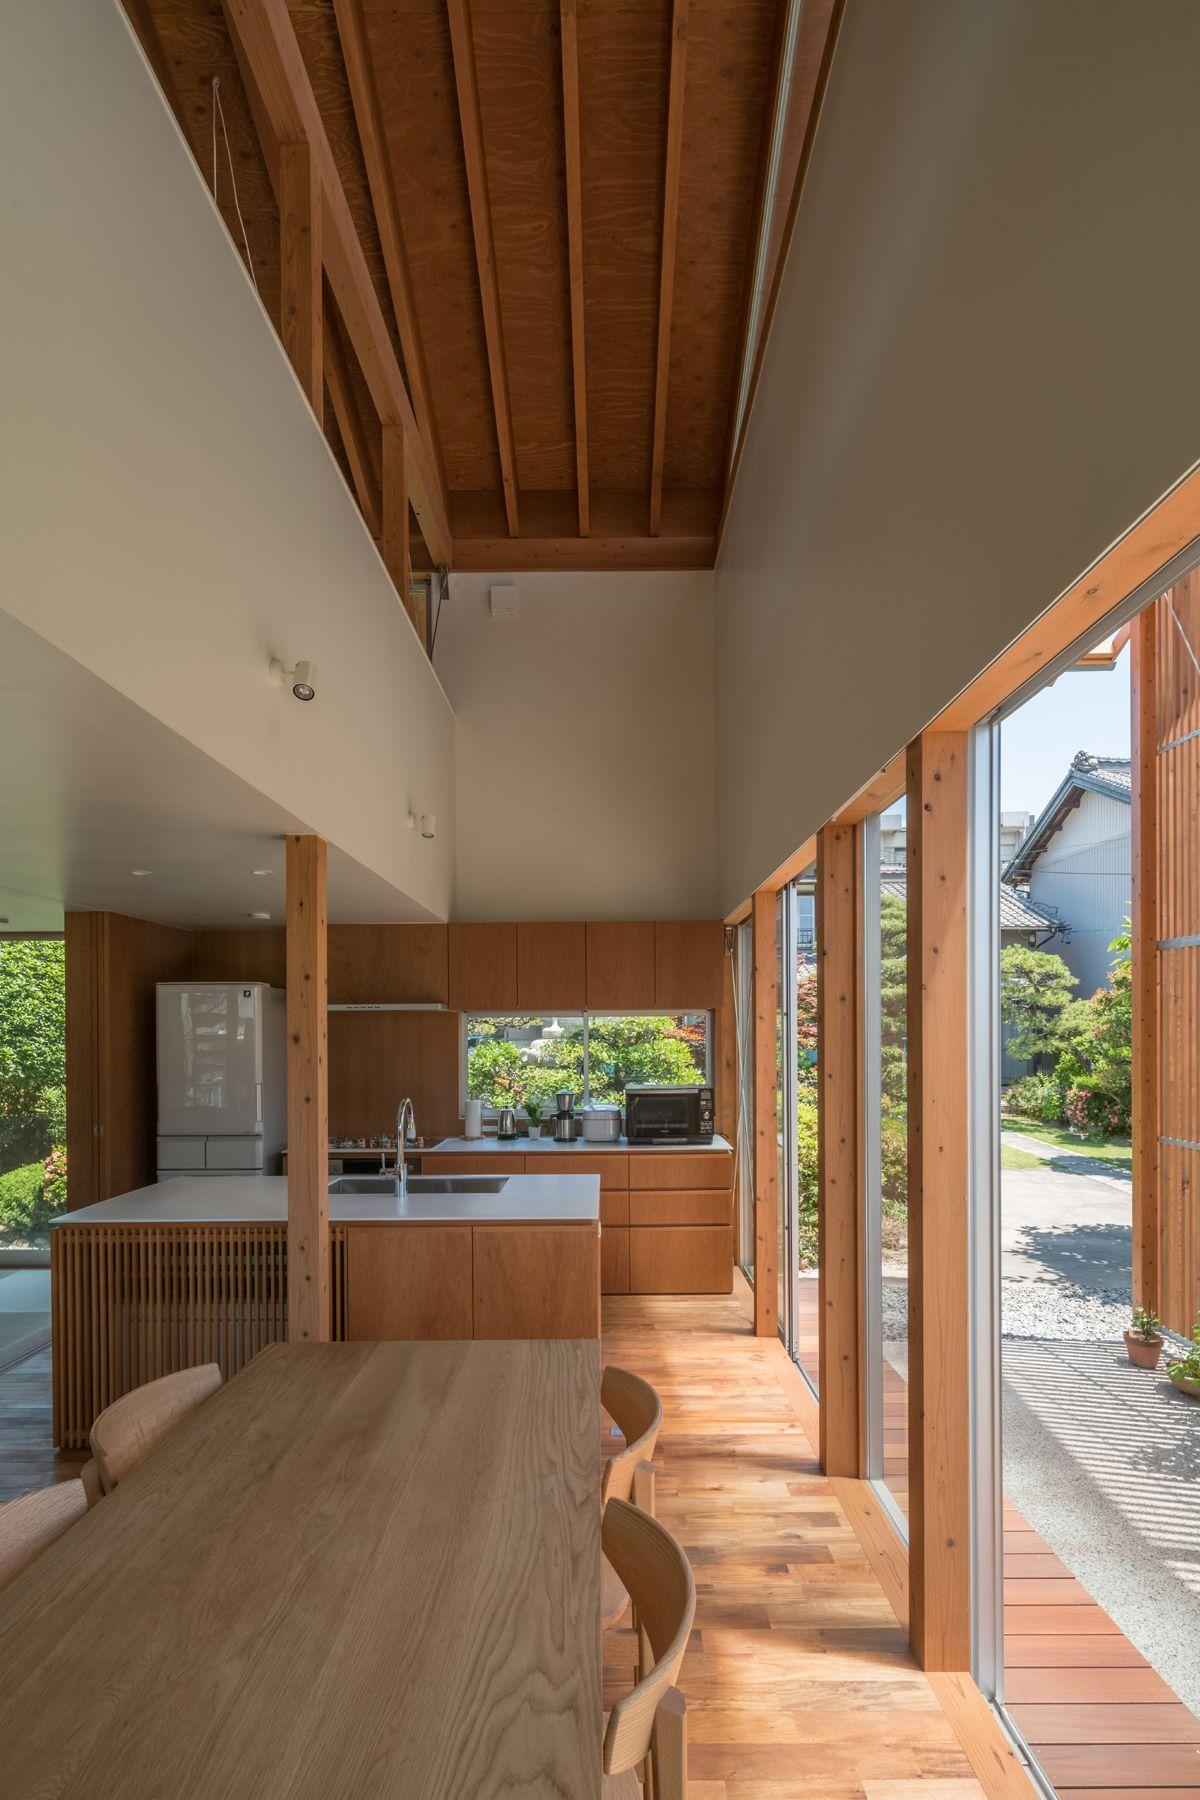 House in otai by mizuishi architect atelier photo hiroshi tanigawa also rh pinterest